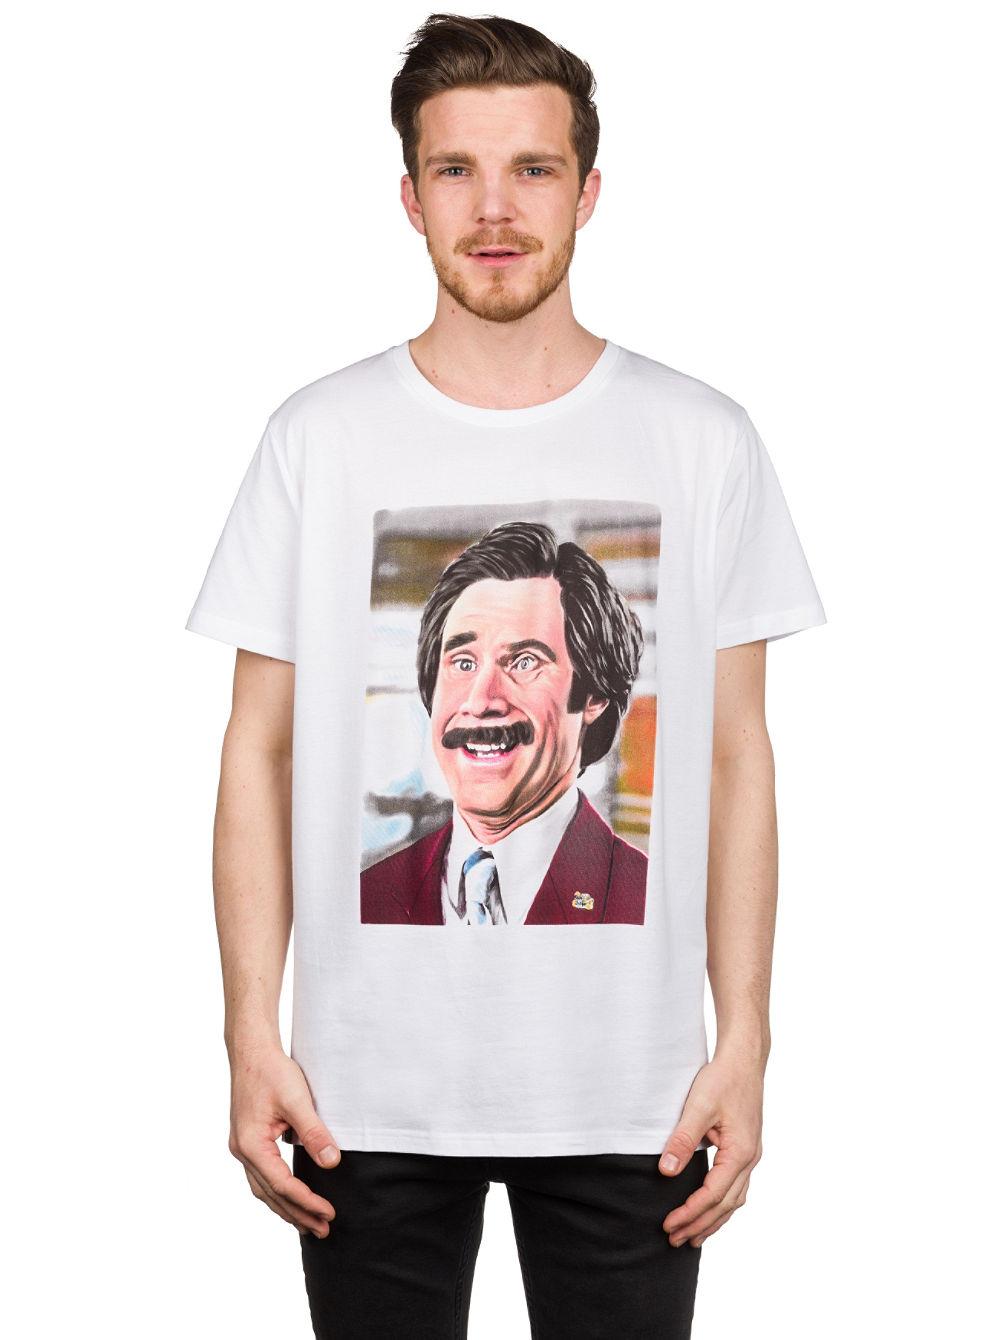 dedicated-san-diego-t-shirt